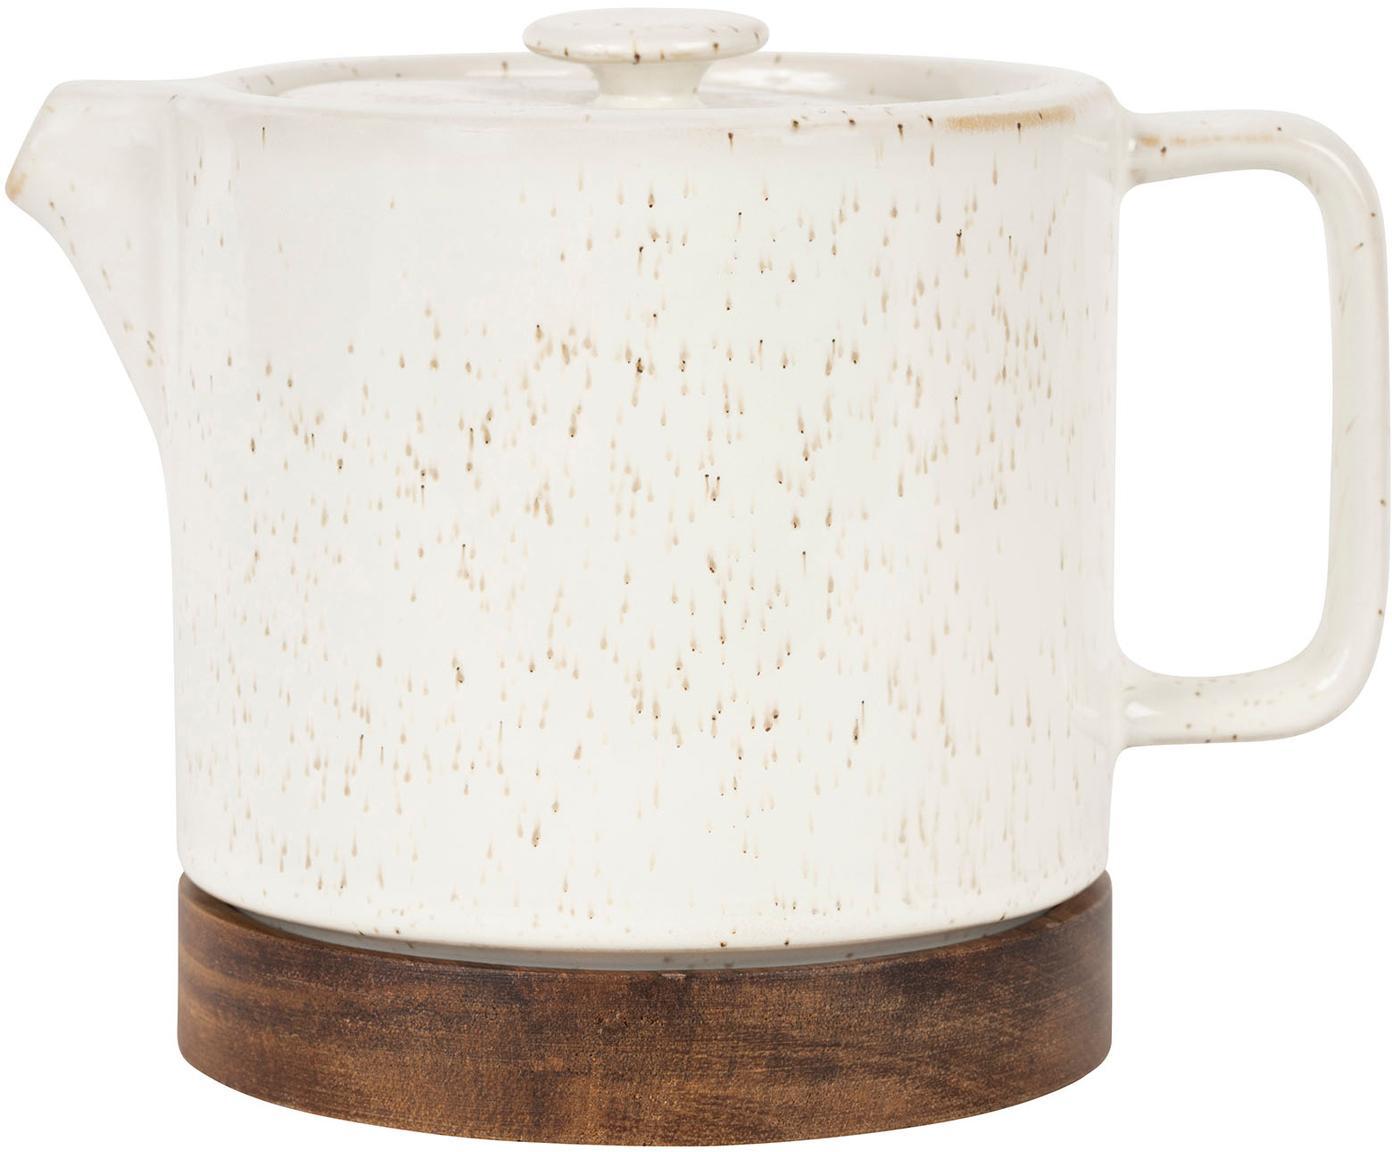 Theepot Nordika, Keramiek, acaciahout, Wit, bruin, Ø 12 cm